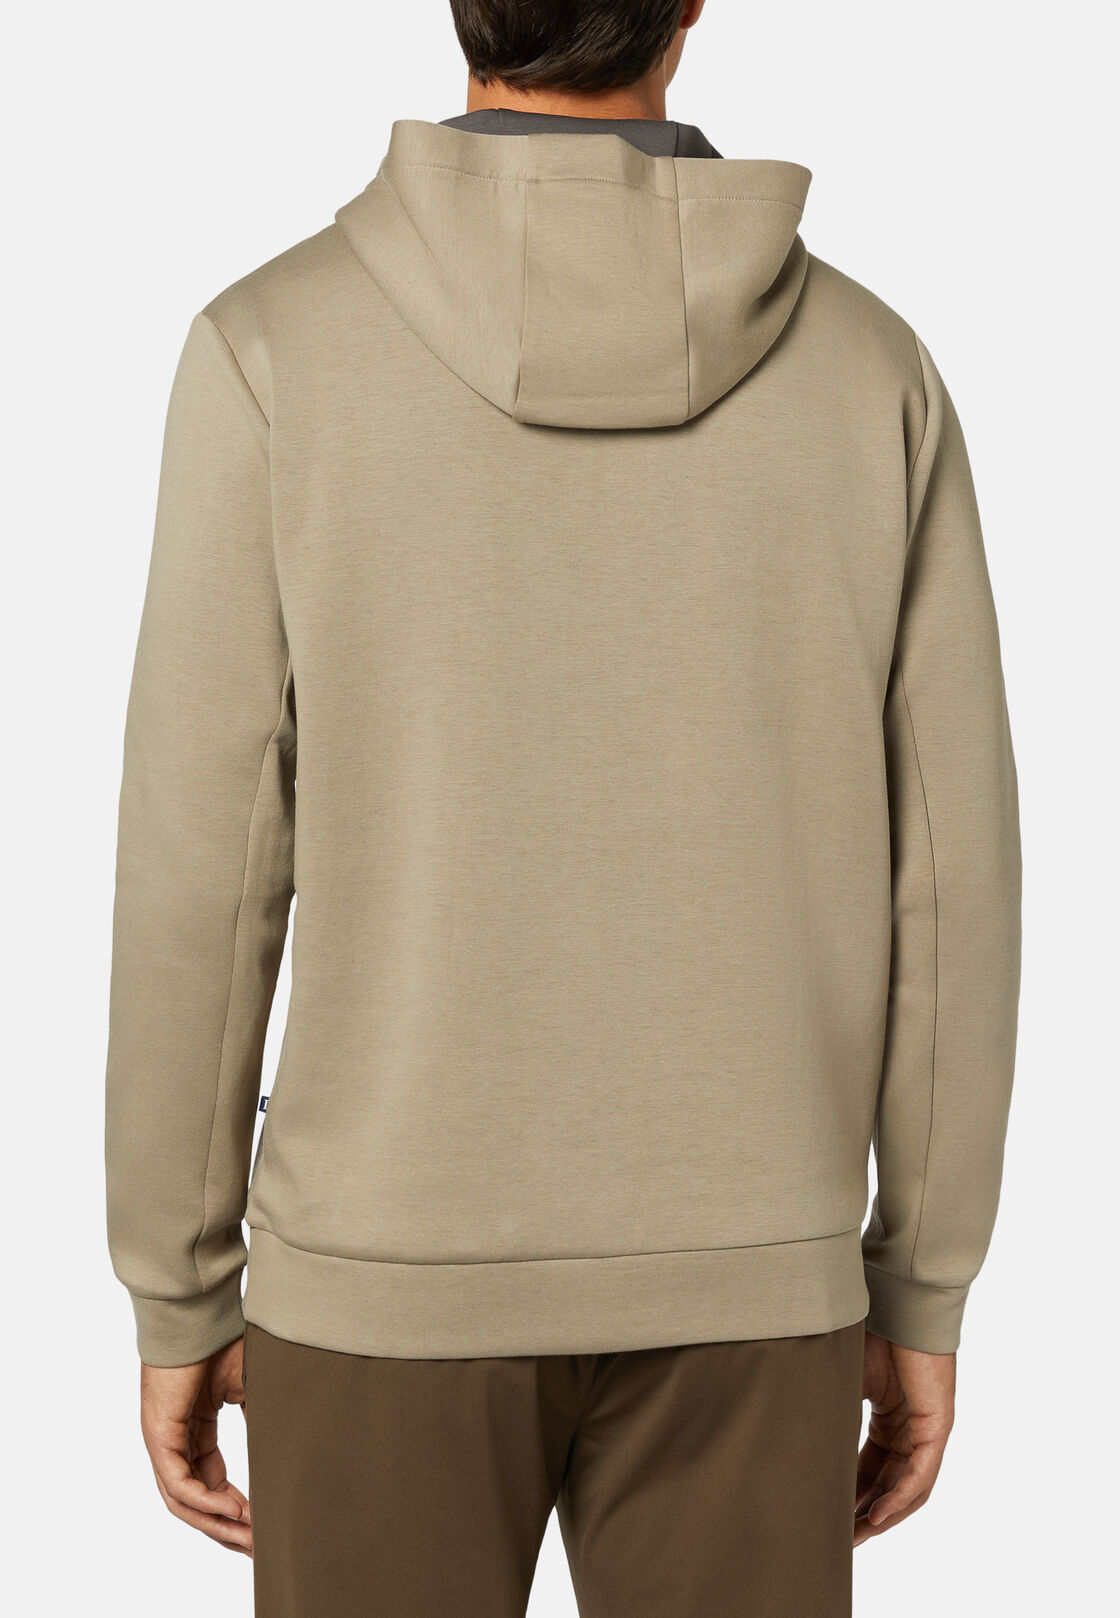 Sweatshirt mit kapuze aus elastischem light scuba, Beige, hi-res